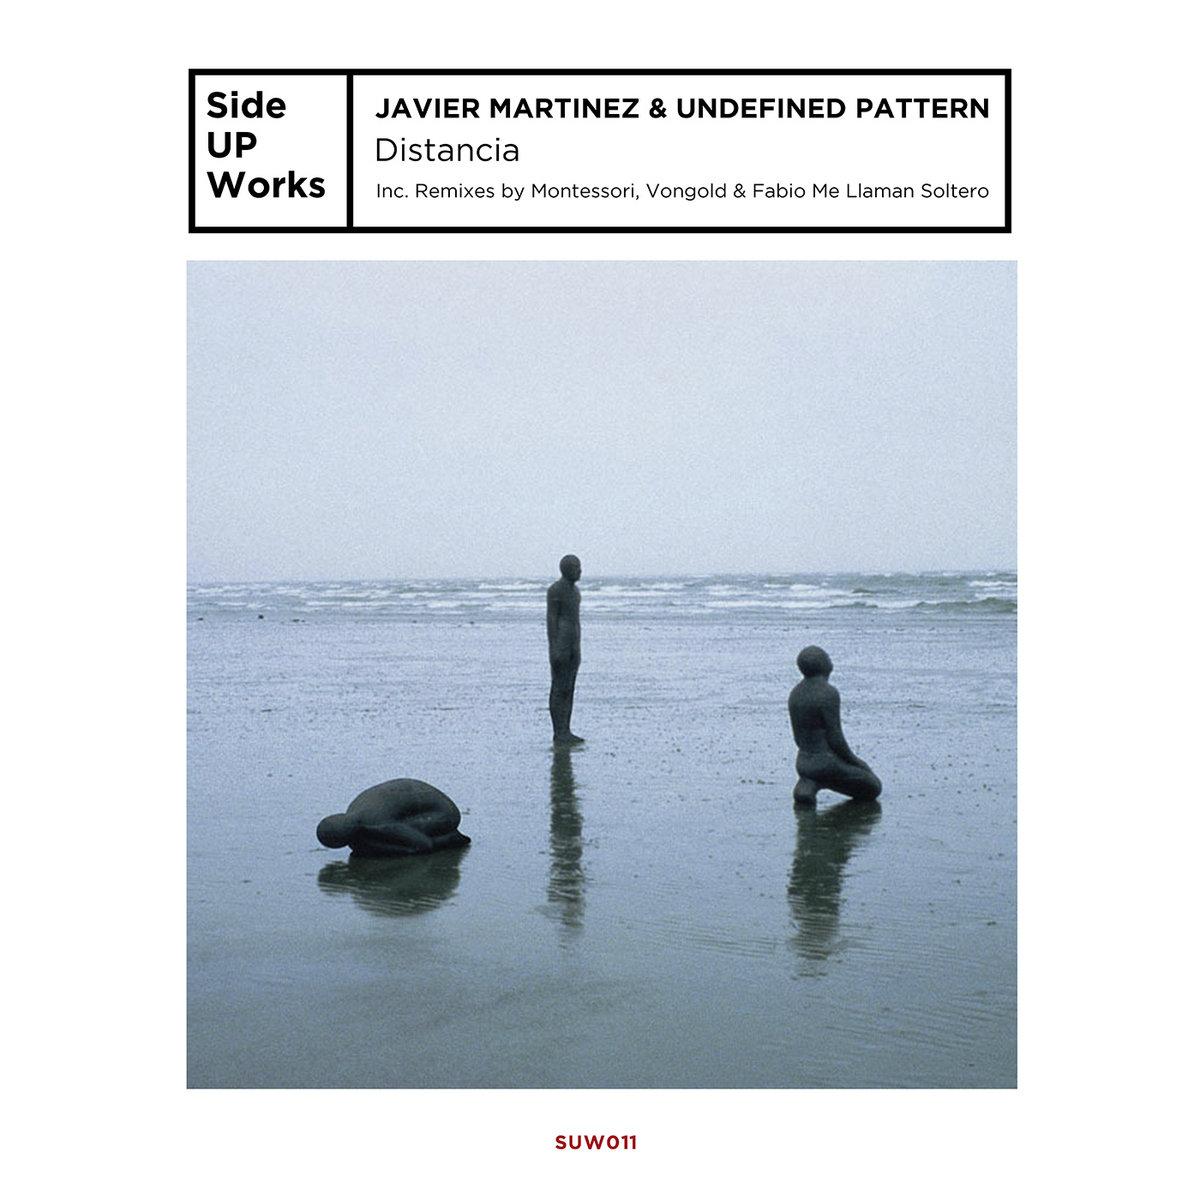 PREMIERE: Javier Martinez & Undefined Pattern - Distancia (Fabio Me Llaman Soltero Remix) [Side Up Works]